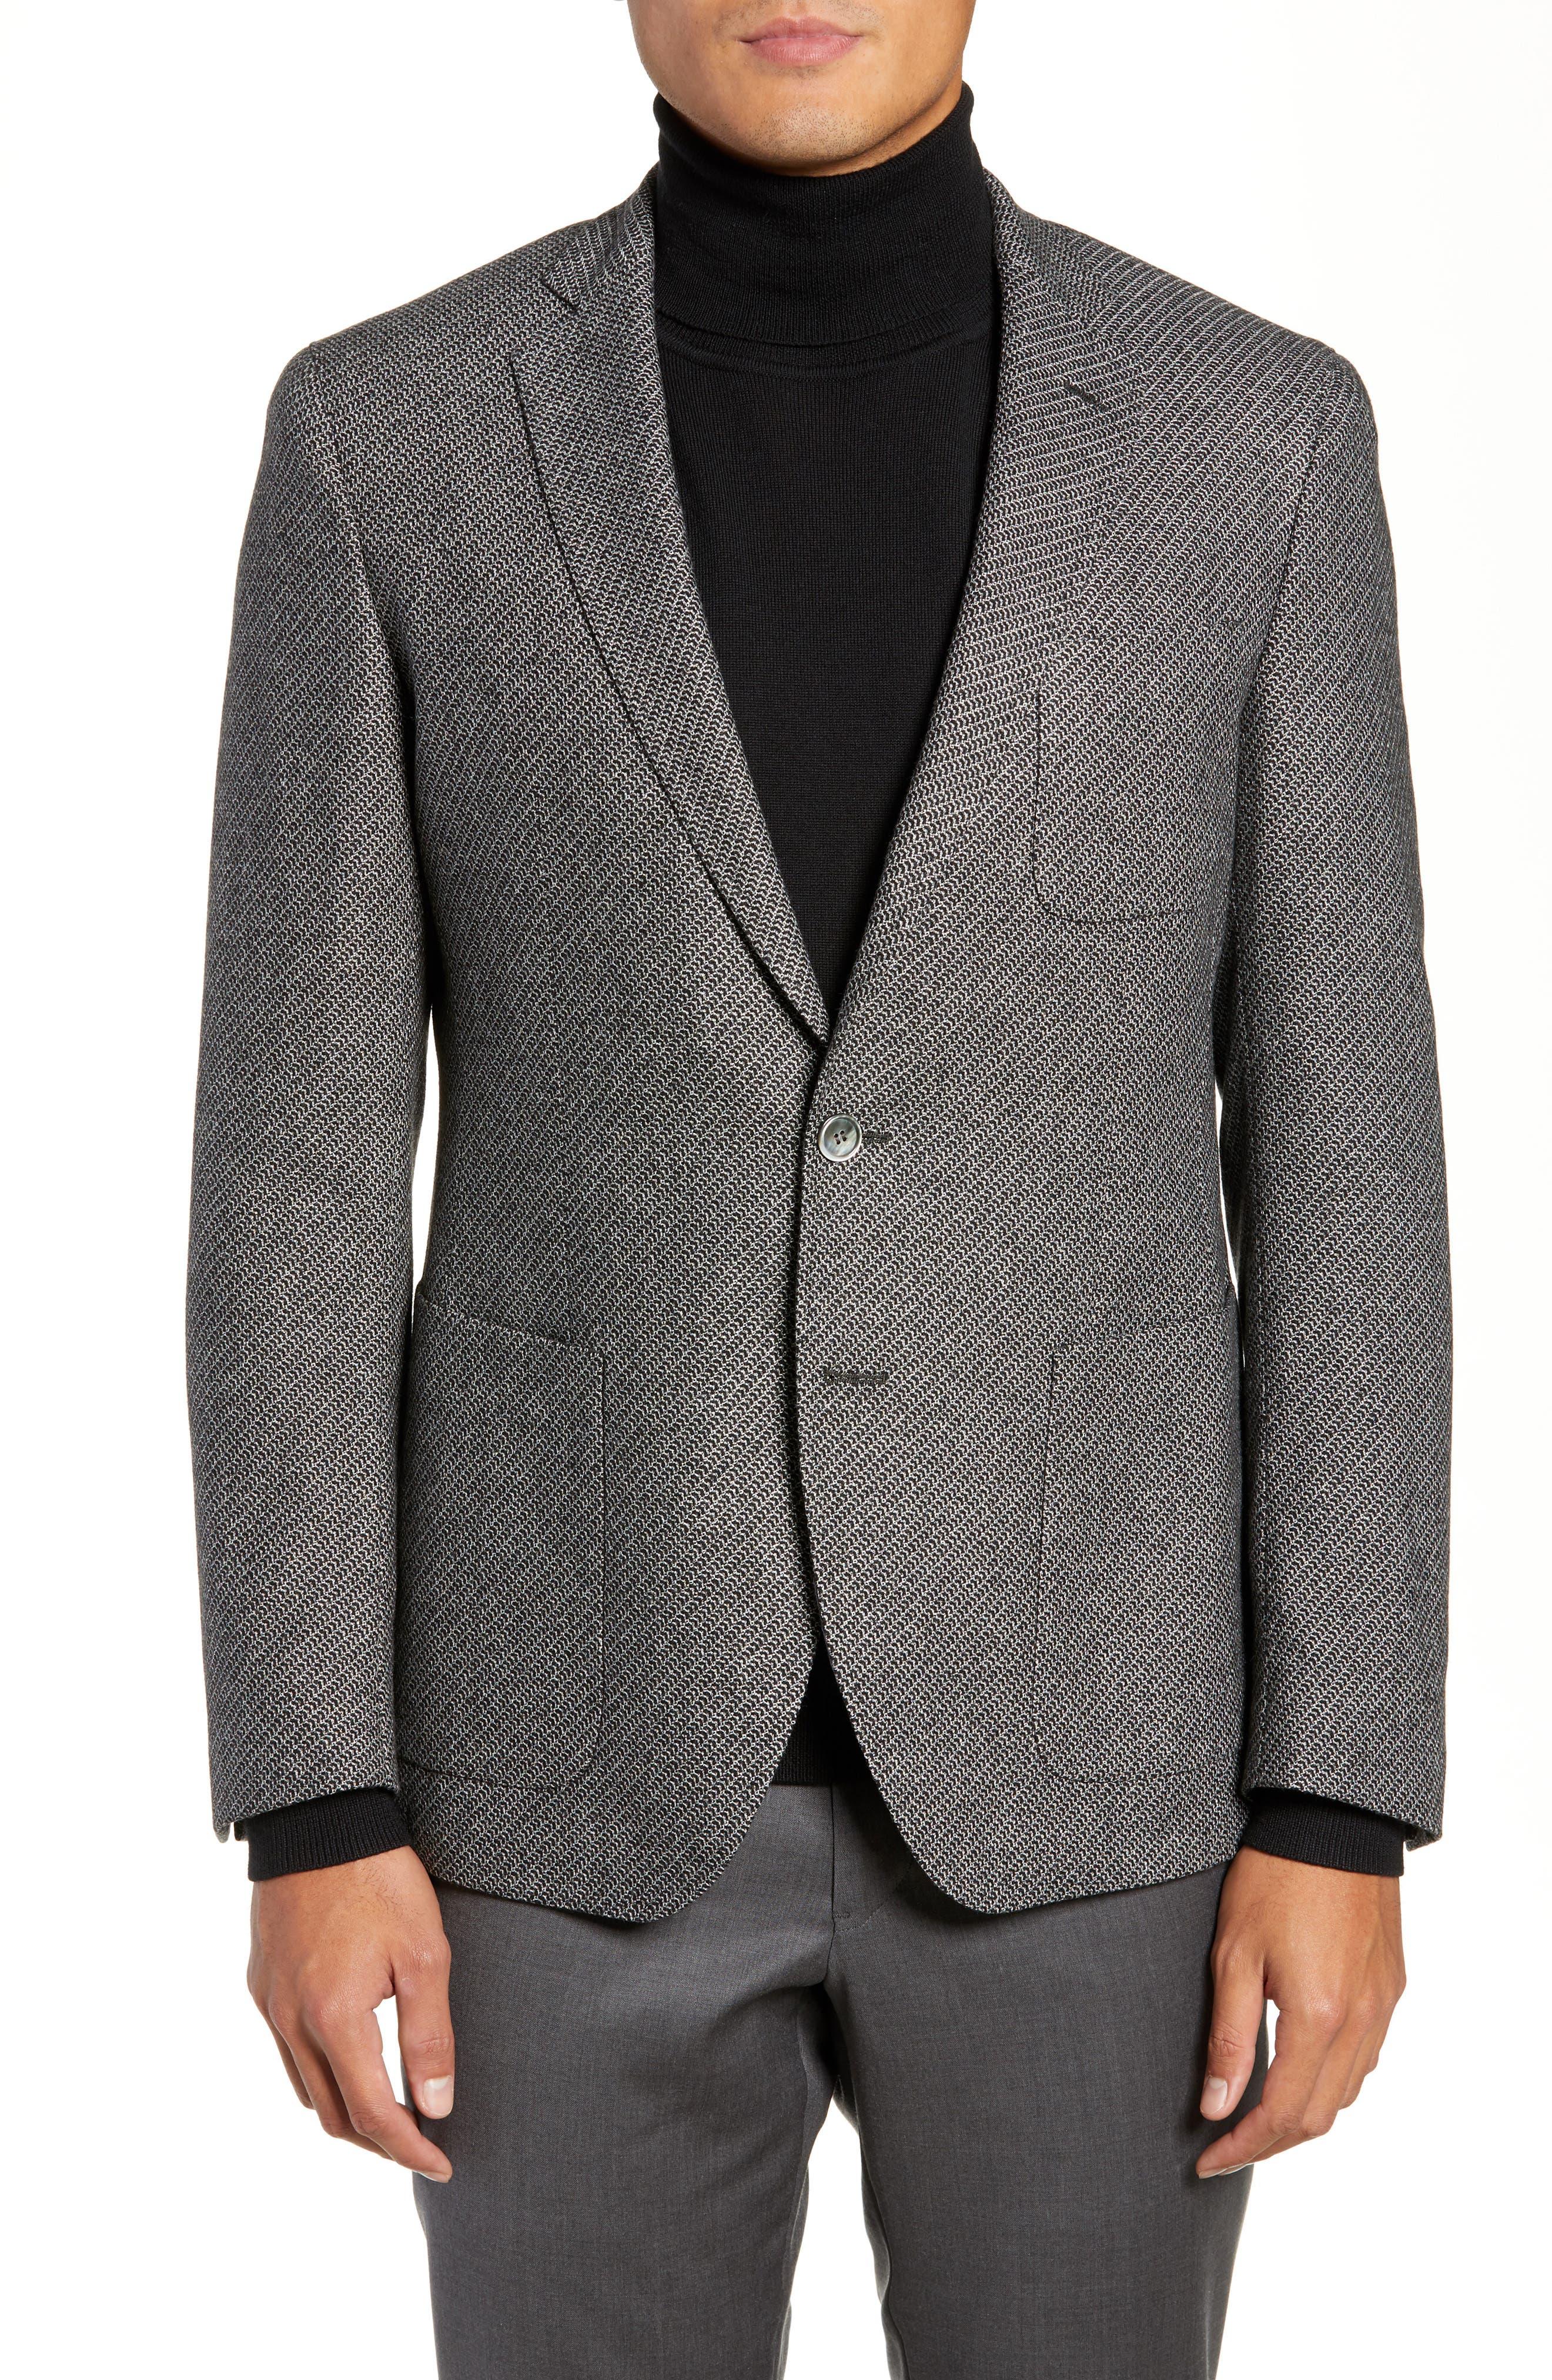 Raye Extra Trim Fit Wool Blend Blazer,                             Main thumbnail 1, color,                             DARK GREY